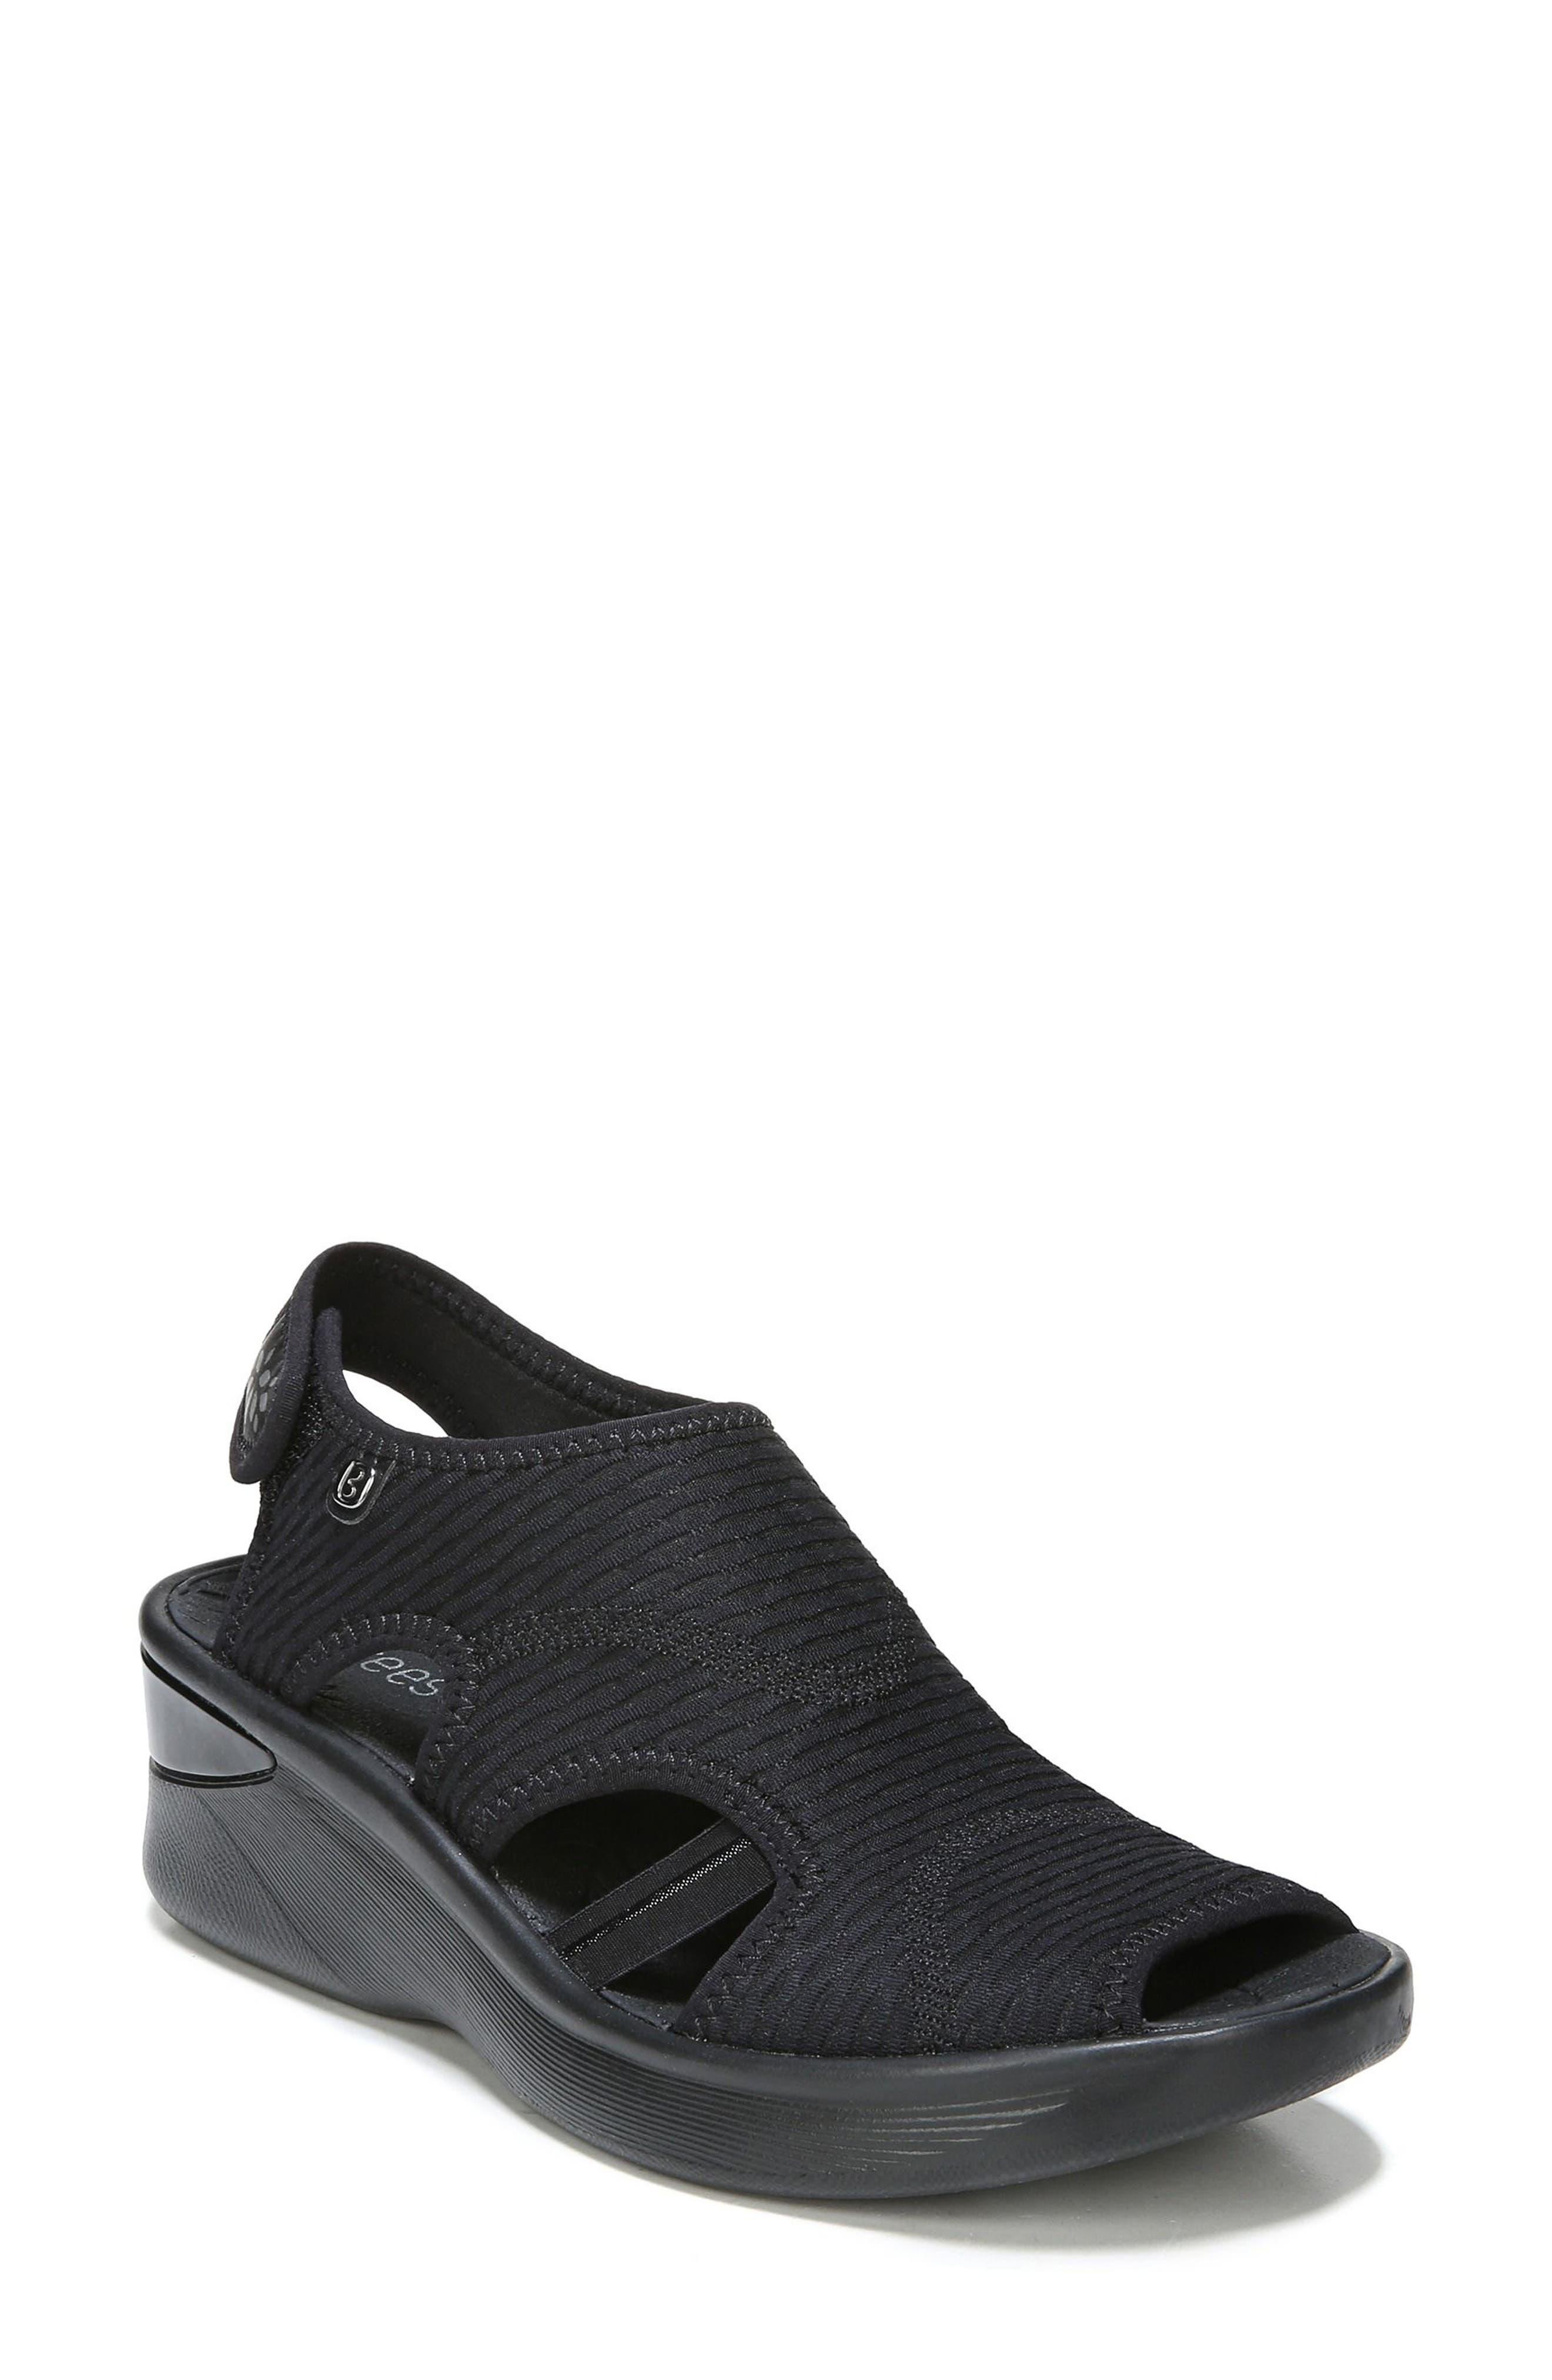 Spirit Sandal,                         Main,                         color, BLACK LEATHER